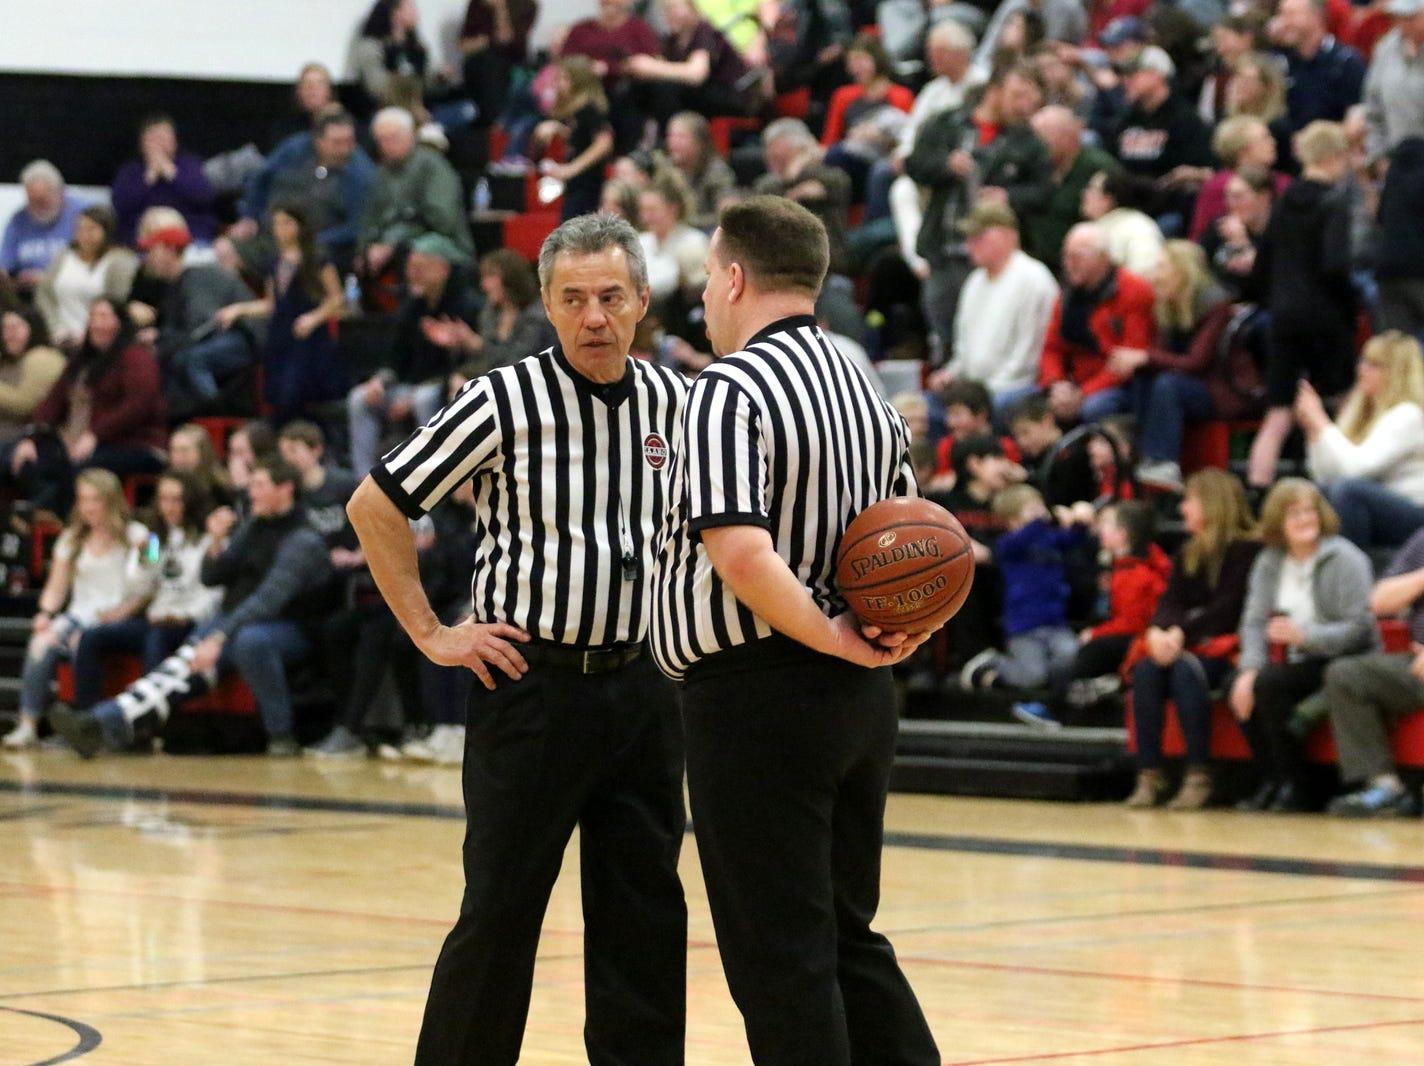 Spencer-Van Etten was a 68-63 winner over Moravia in boys basketball Feb. 8, 2019 at Spencer-Van Etten High School.